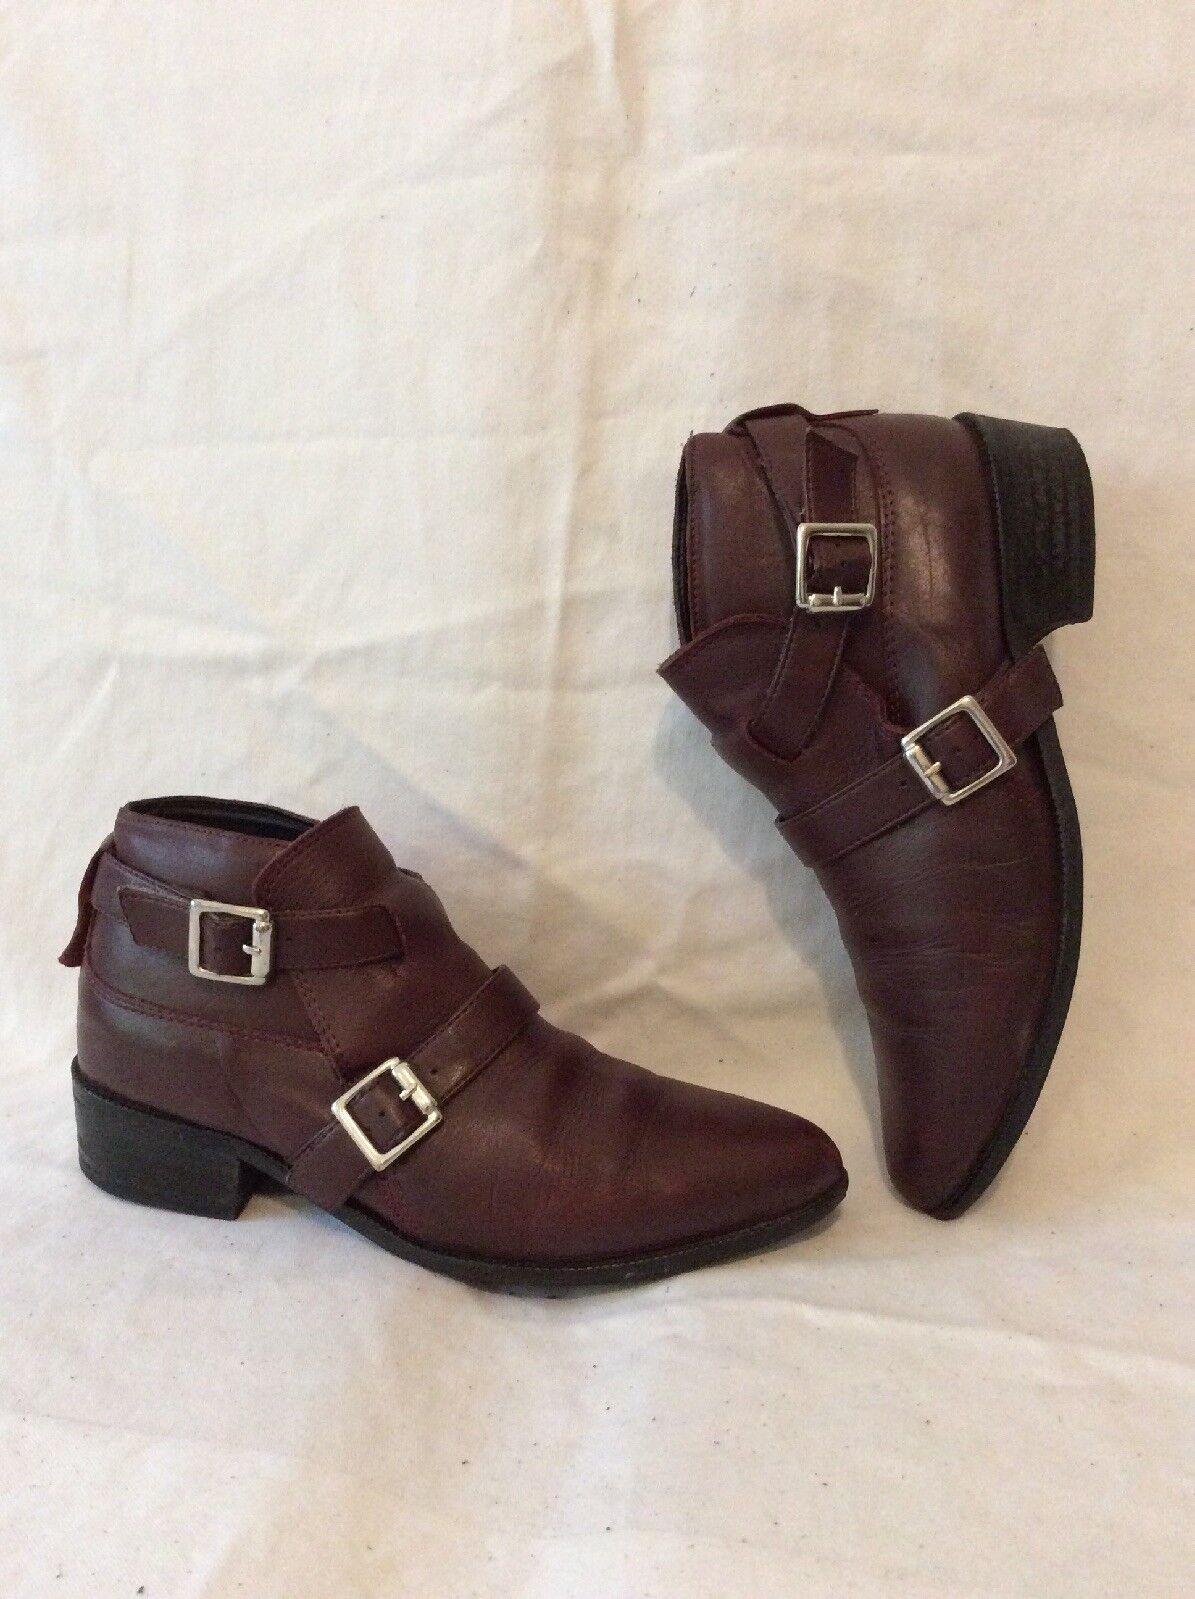 Zara Basic Maroon Ankle Leather Boots Size 36